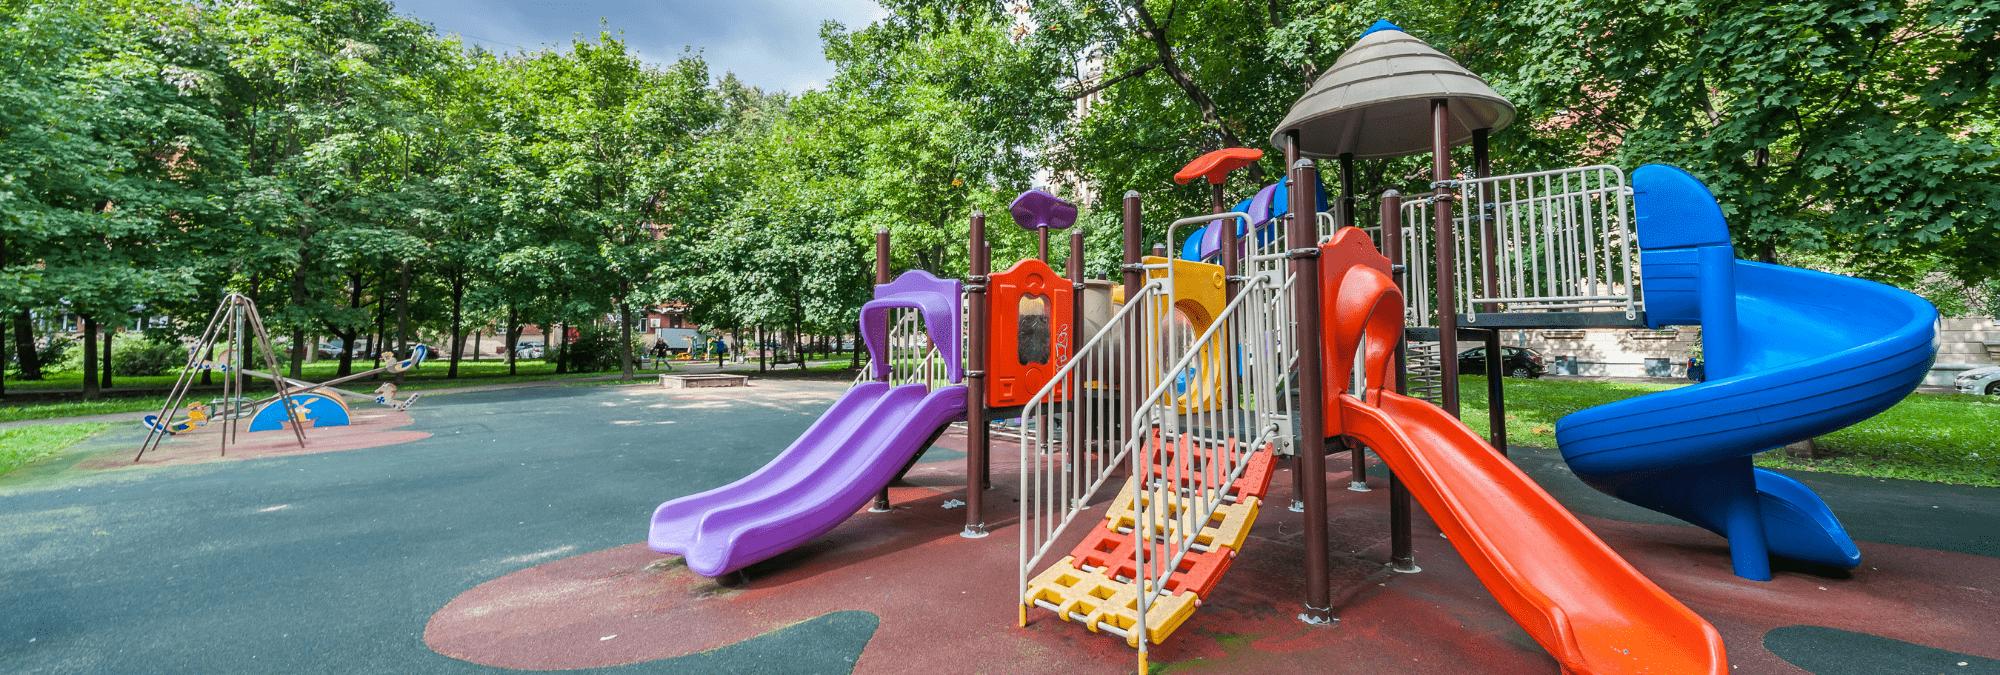 Raegan's Playground